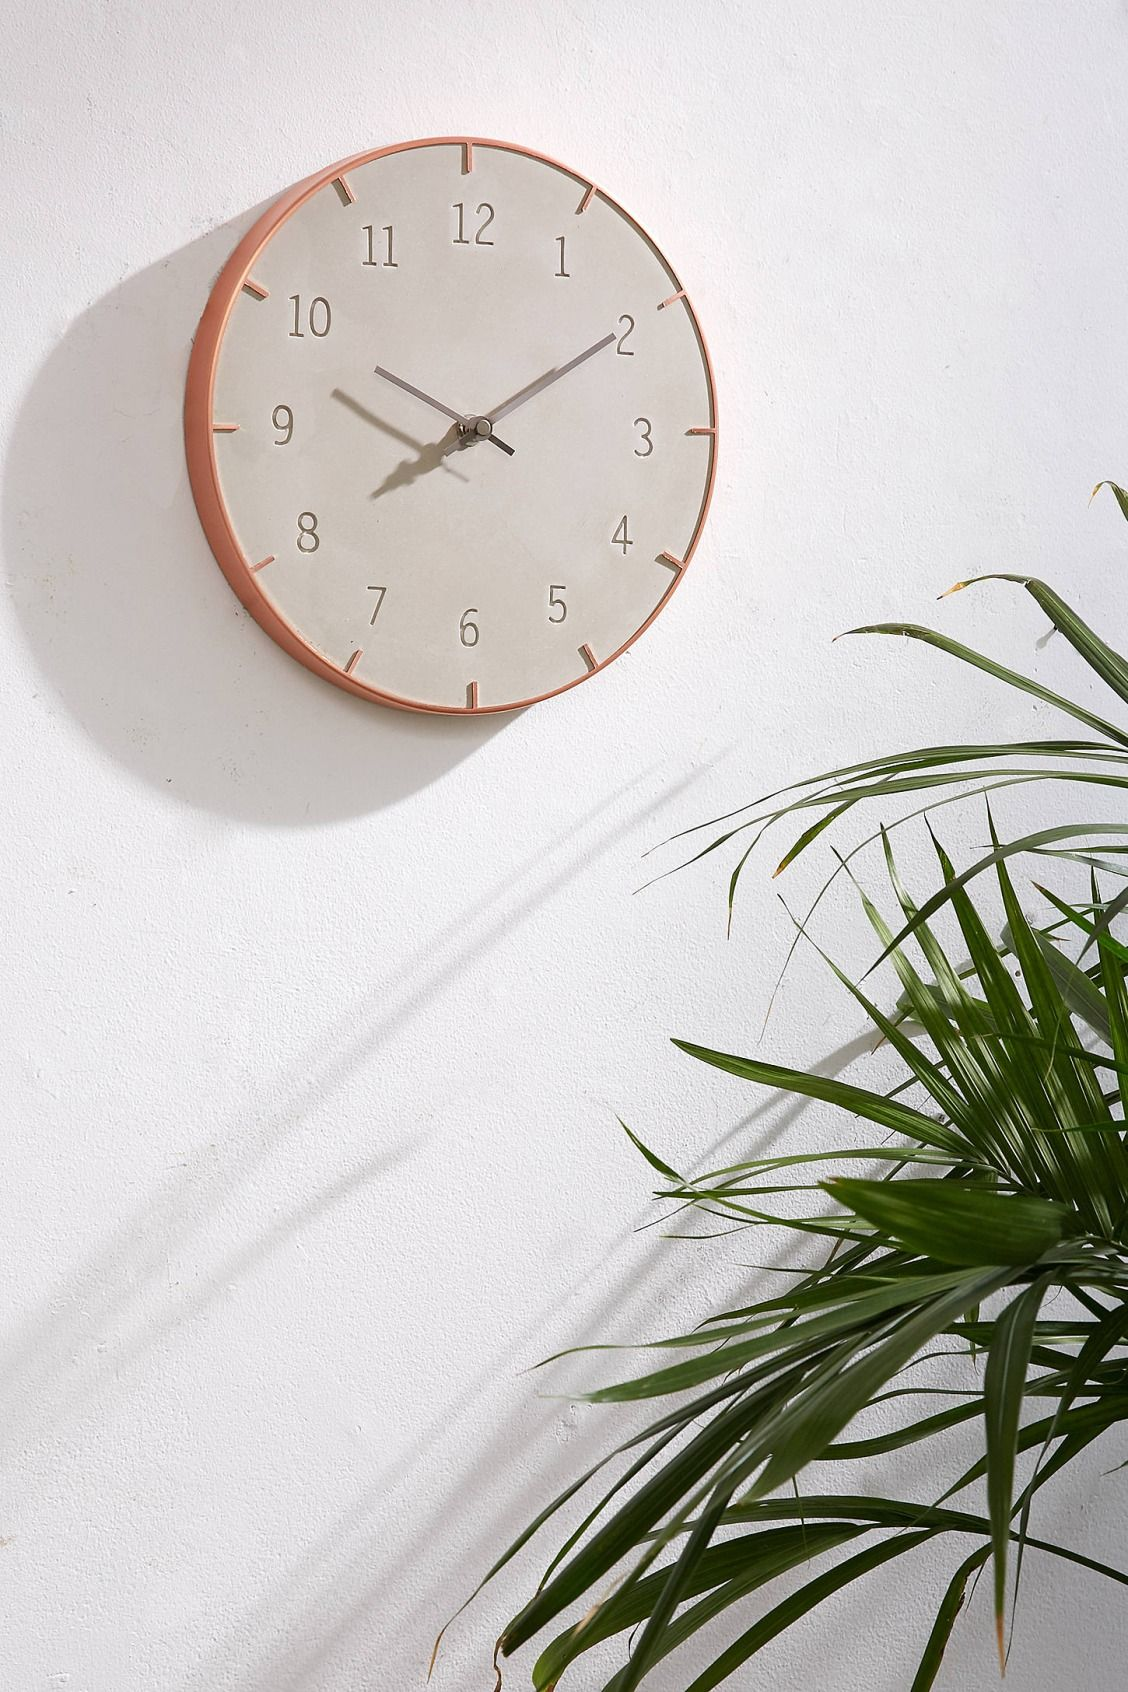 Am americana country wall clocks - Abbi Concrete Wall Clock